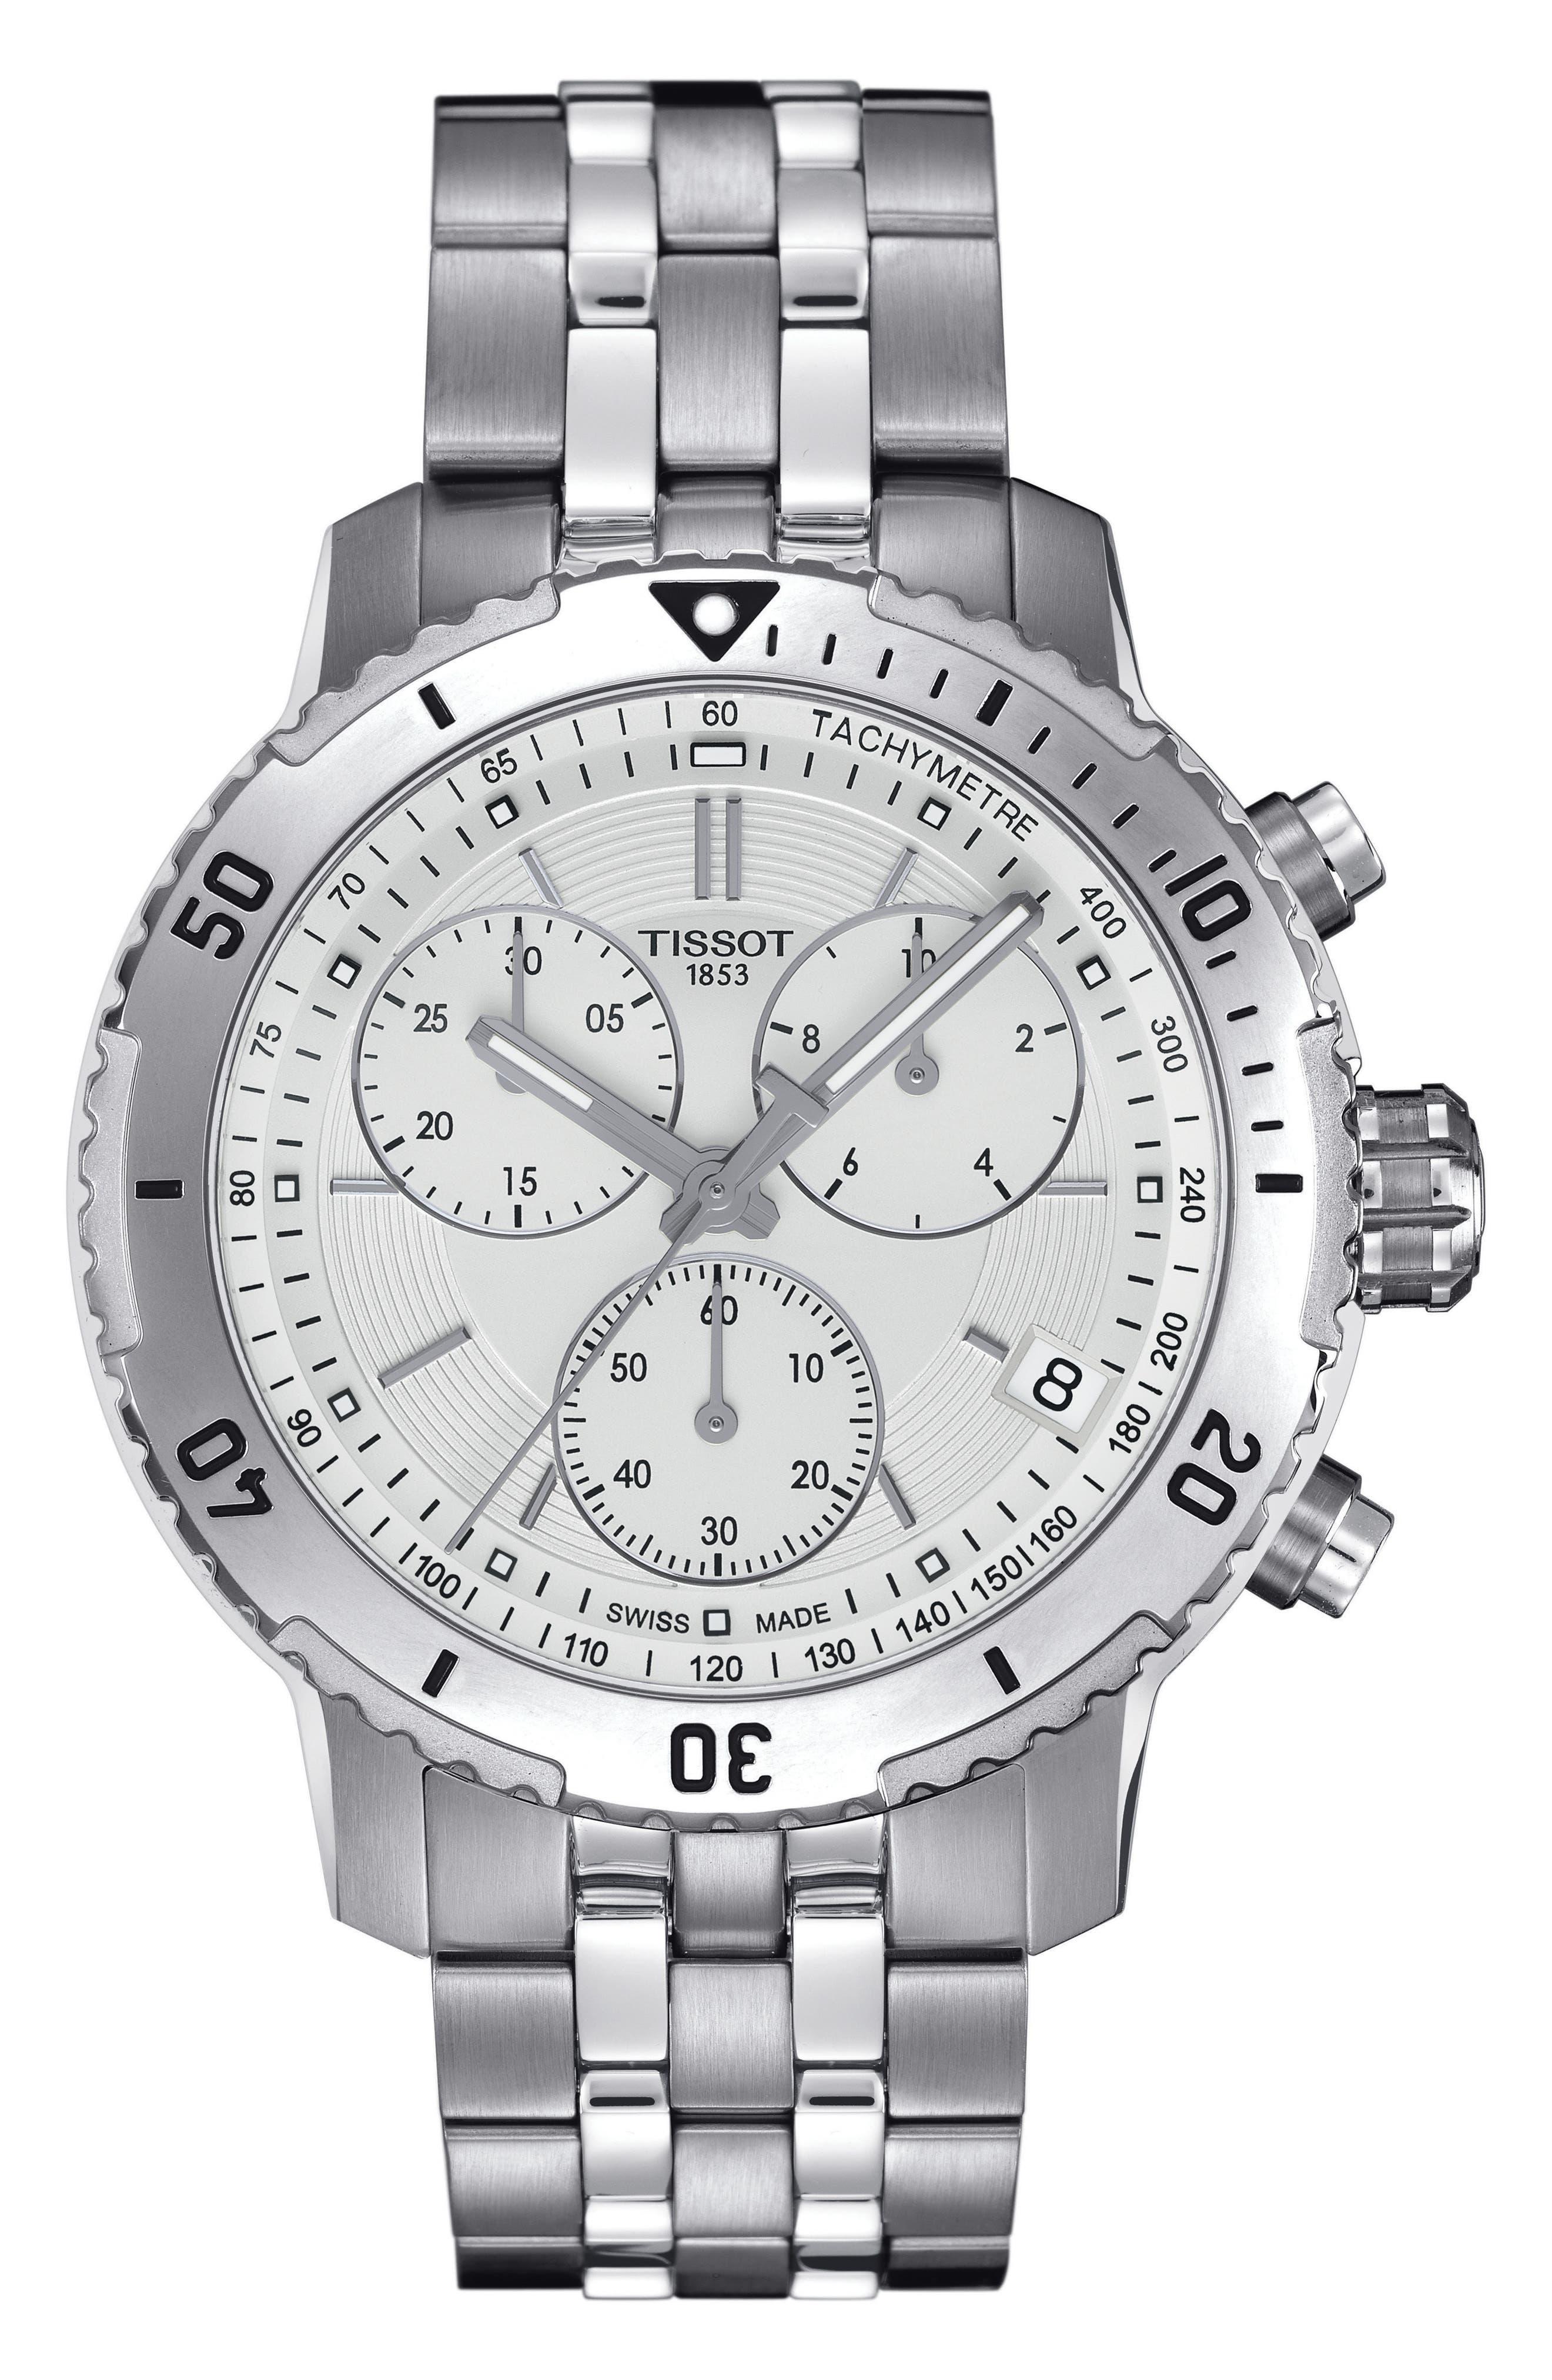 Image of Tissot Men's PRS 200 Chronograph Bracelet Watch, 41mm